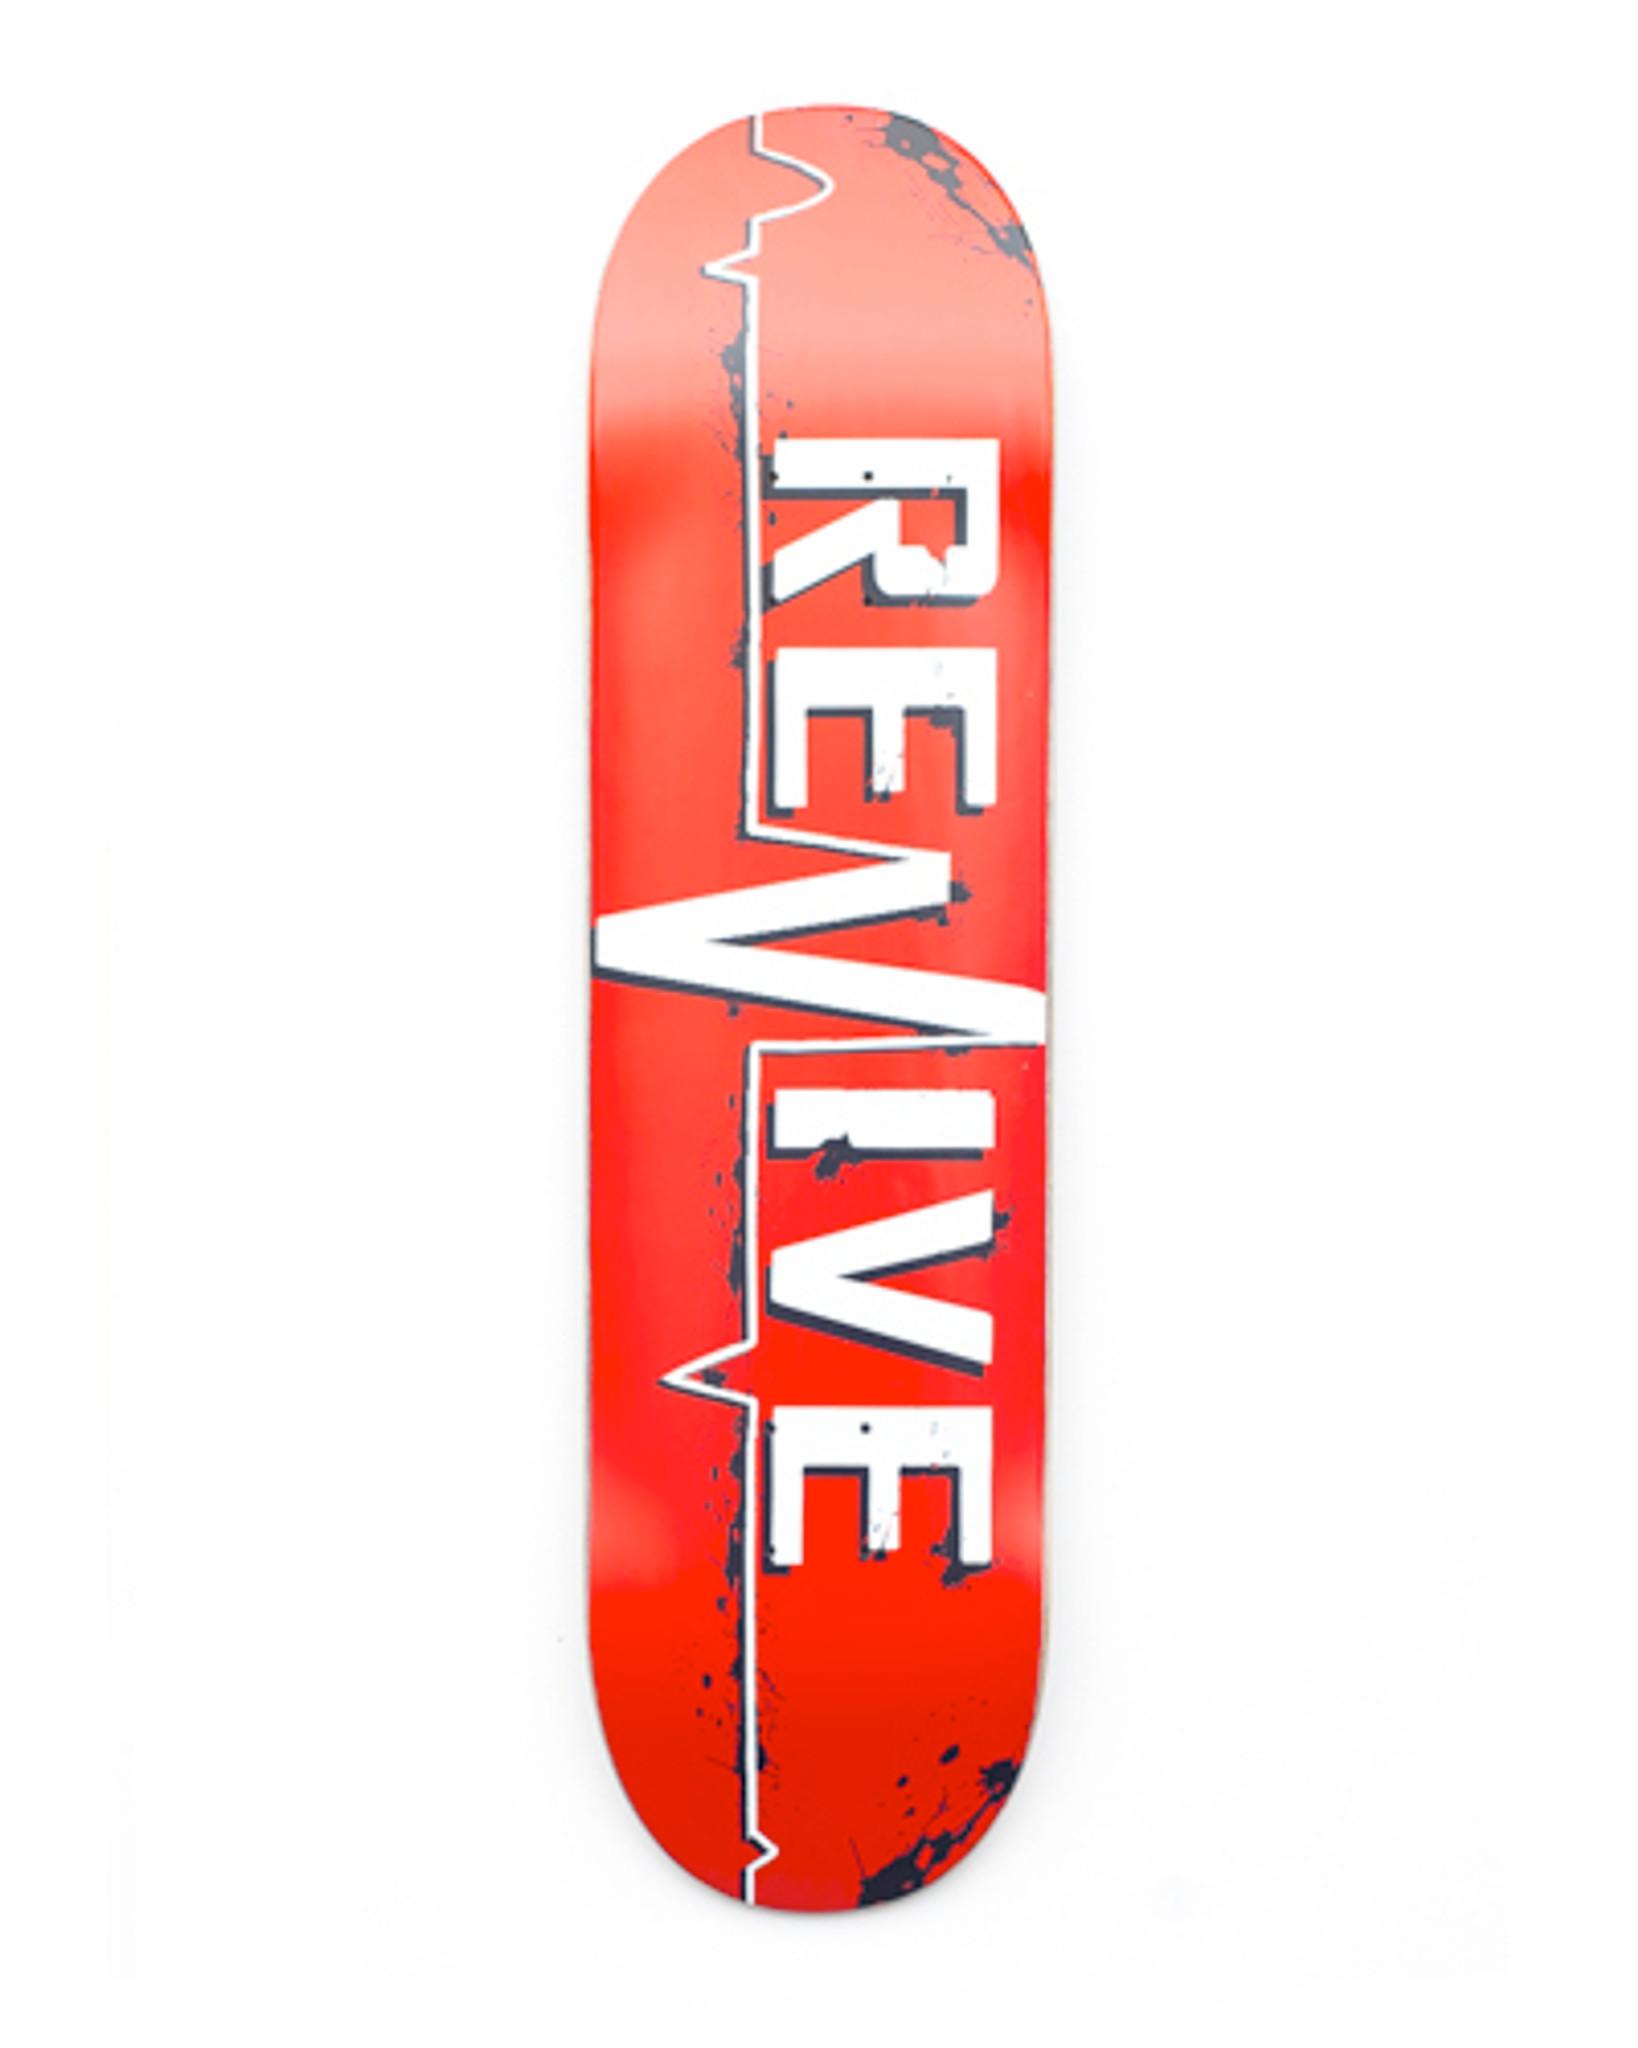 170c5b5a55 Red Lifeline - Deck - Revive Skateboards